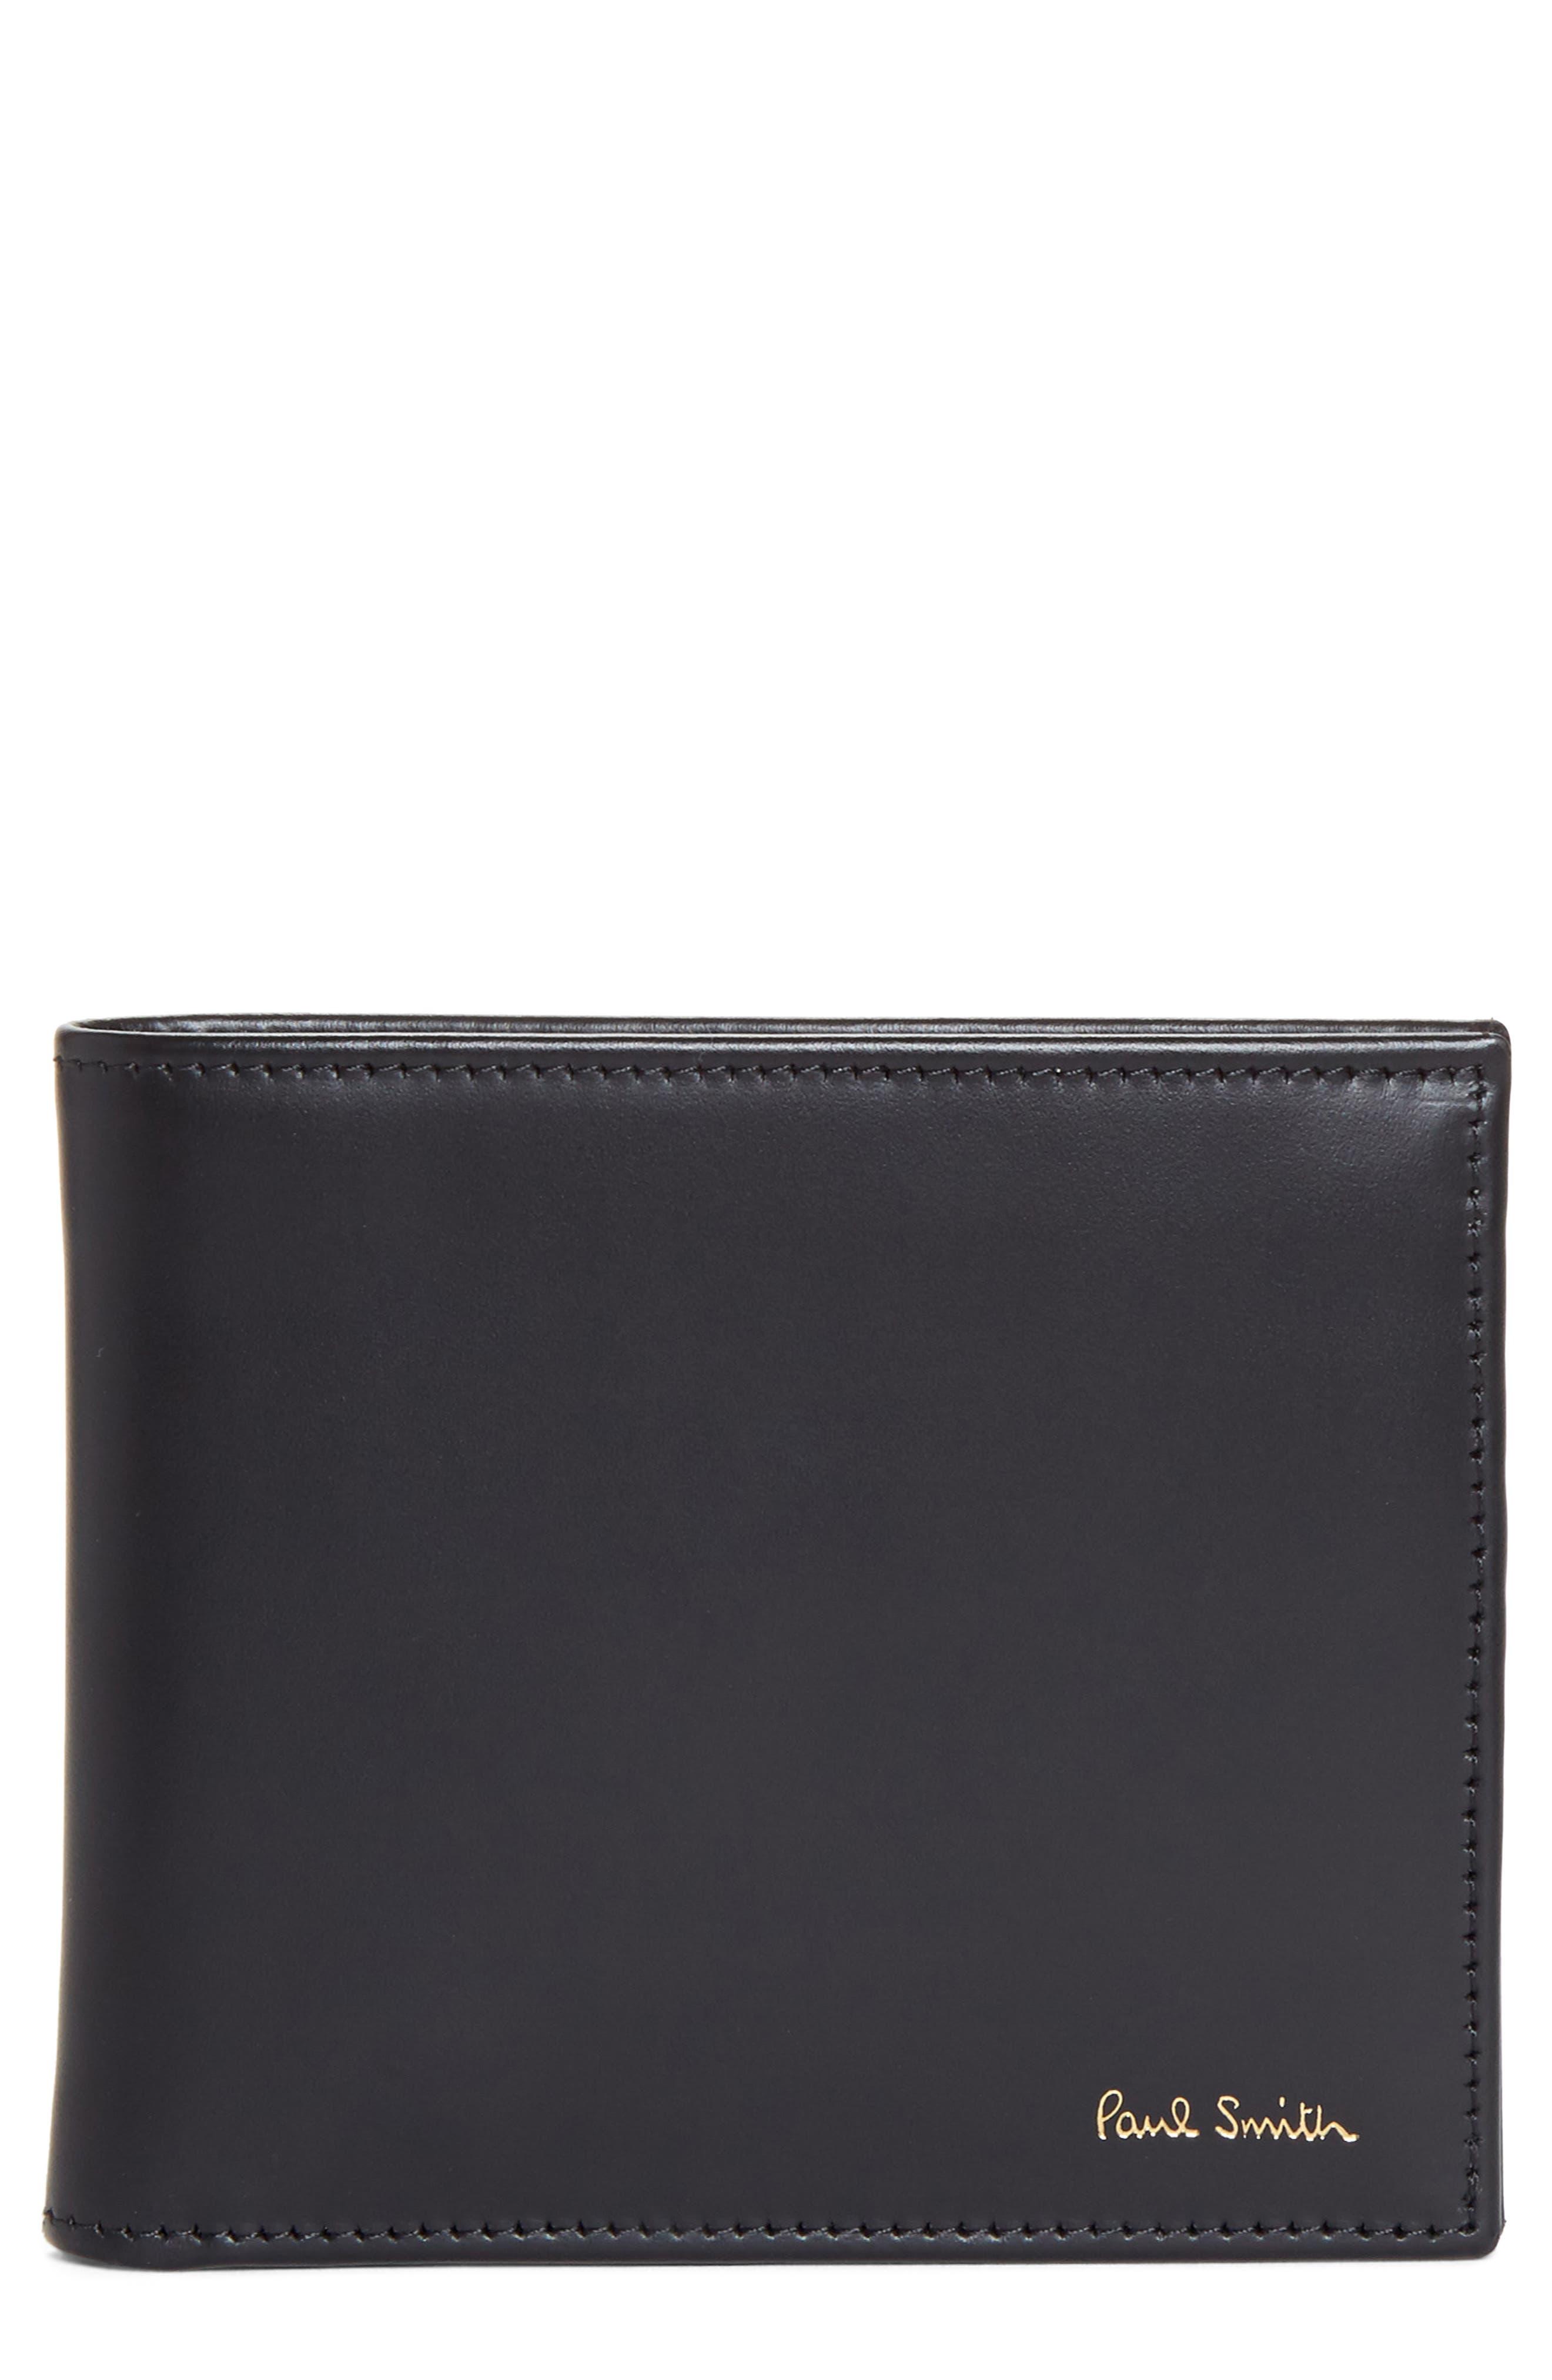 Multistripe Leather Wallet,                             Main thumbnail 1, color,